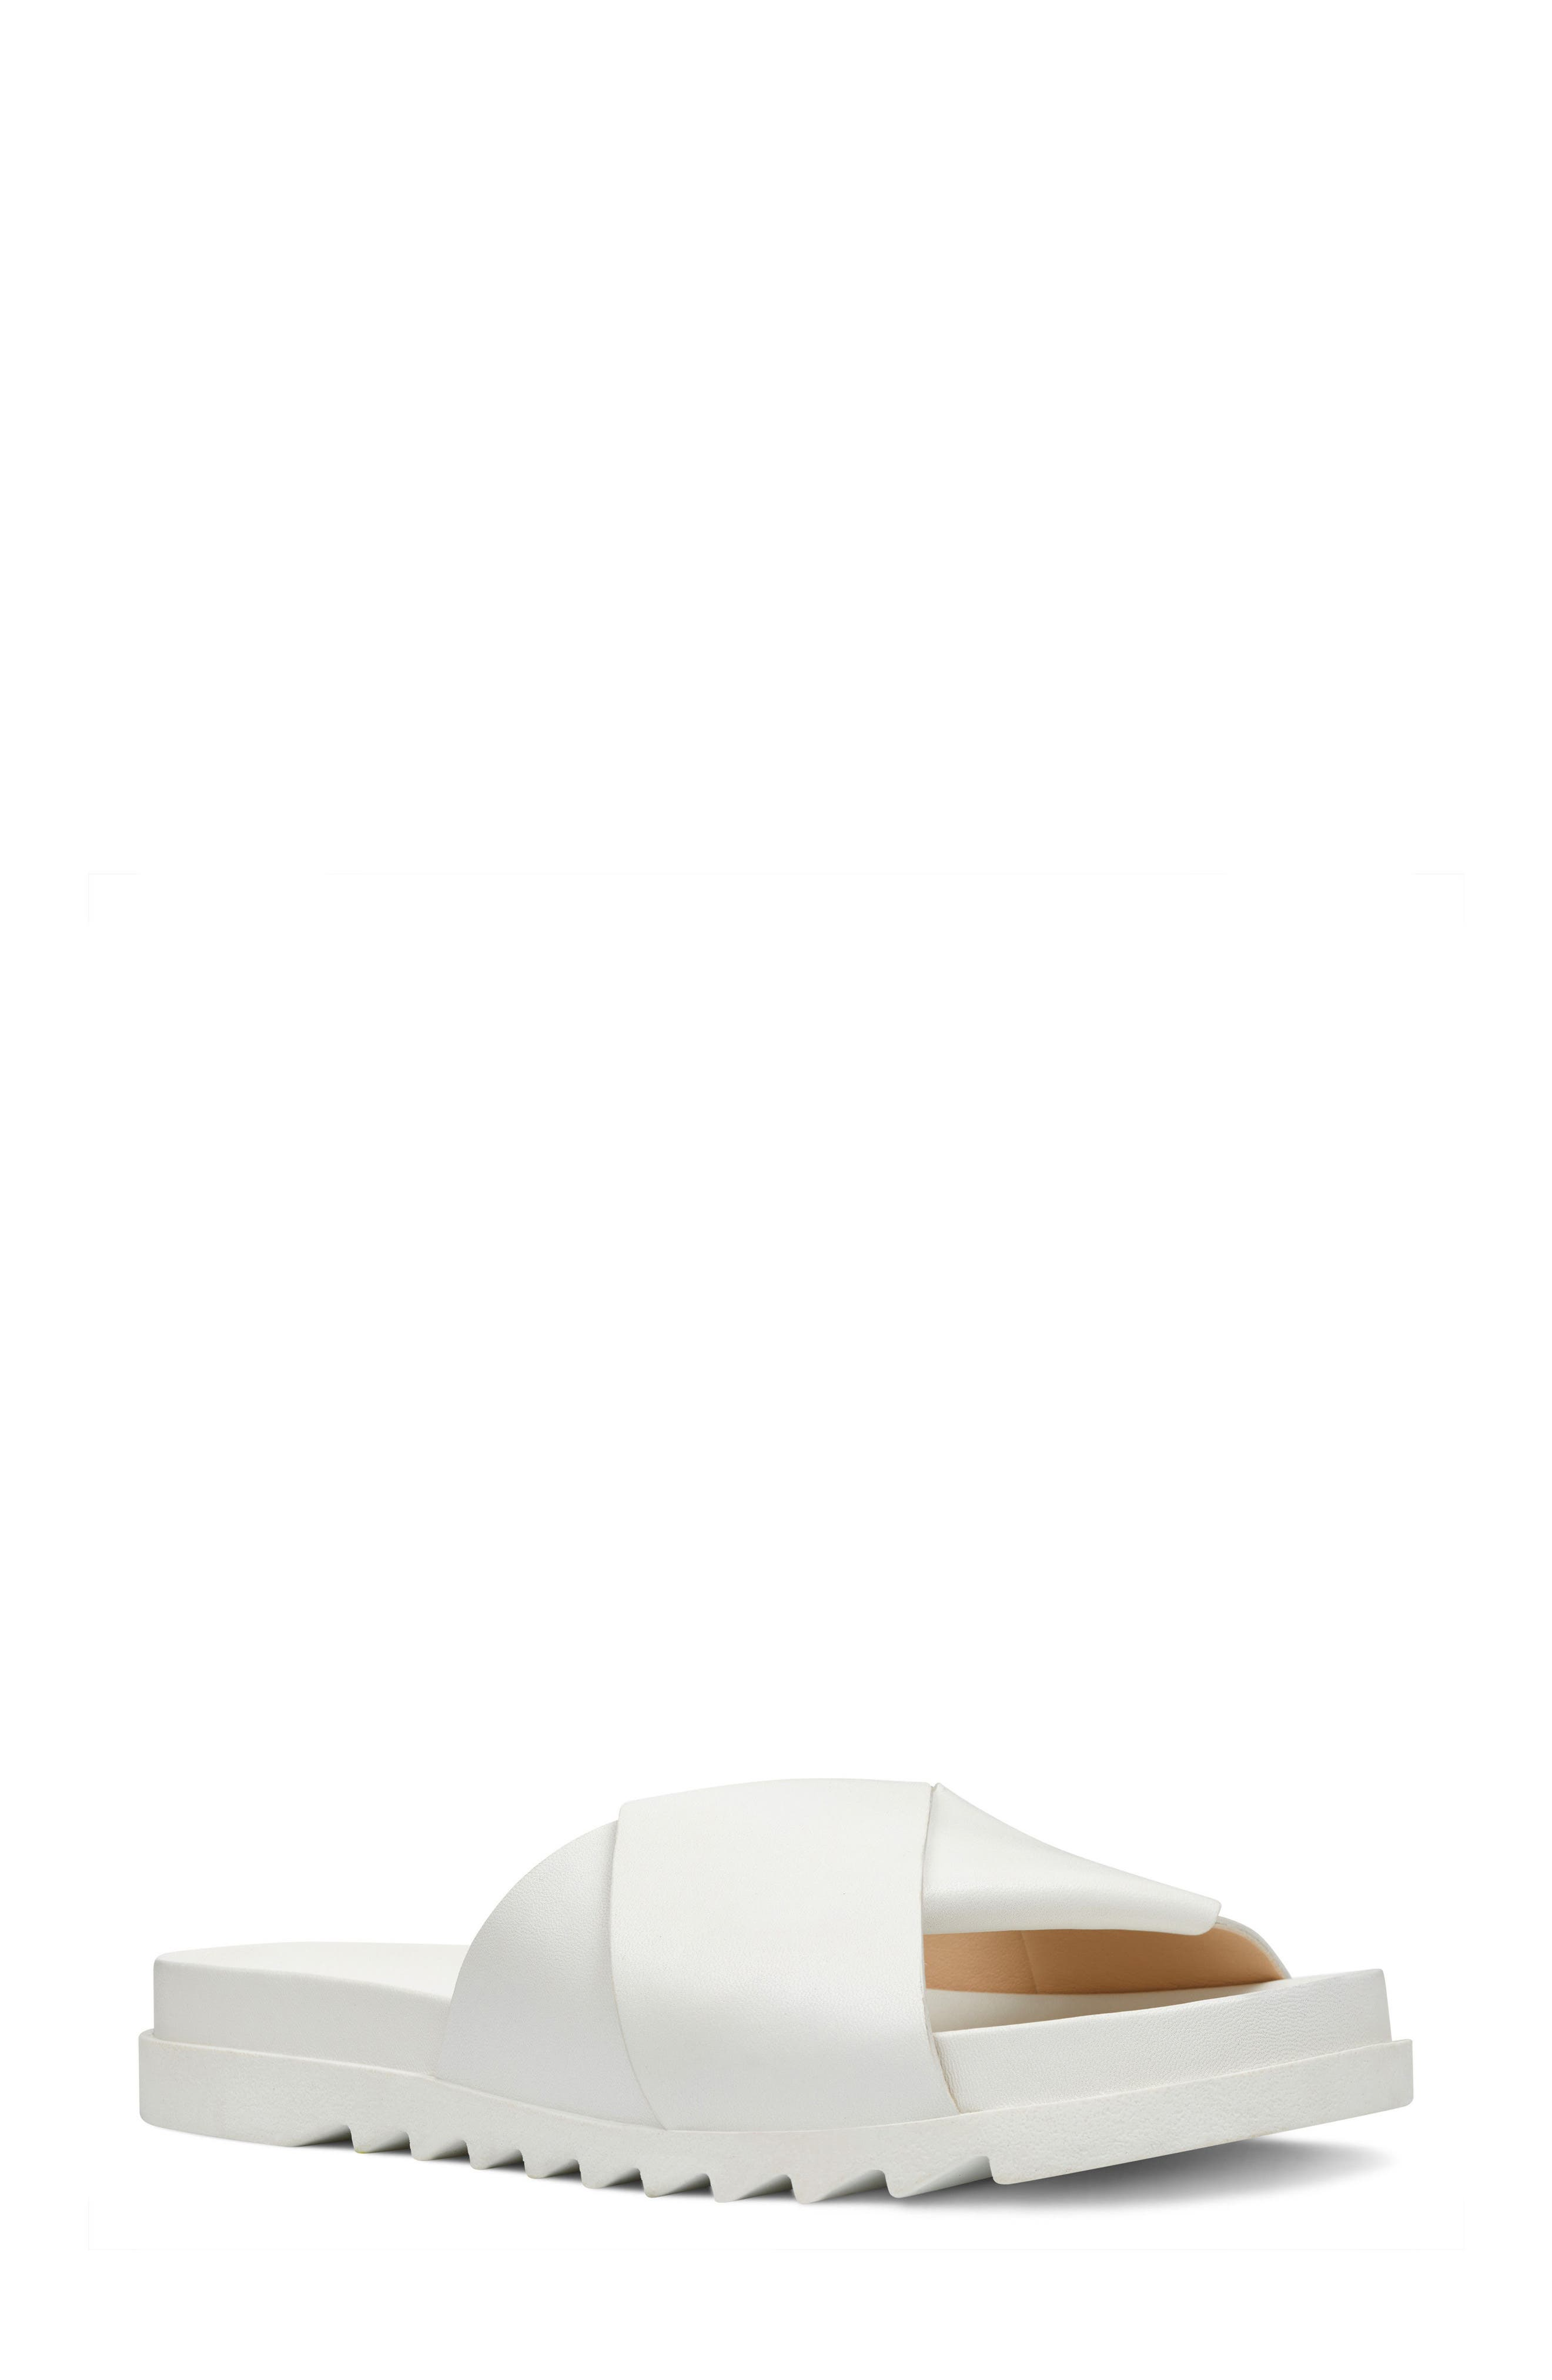 Furaish Slide Sandal,                             Main thumbnail 1, color,                             White Leather